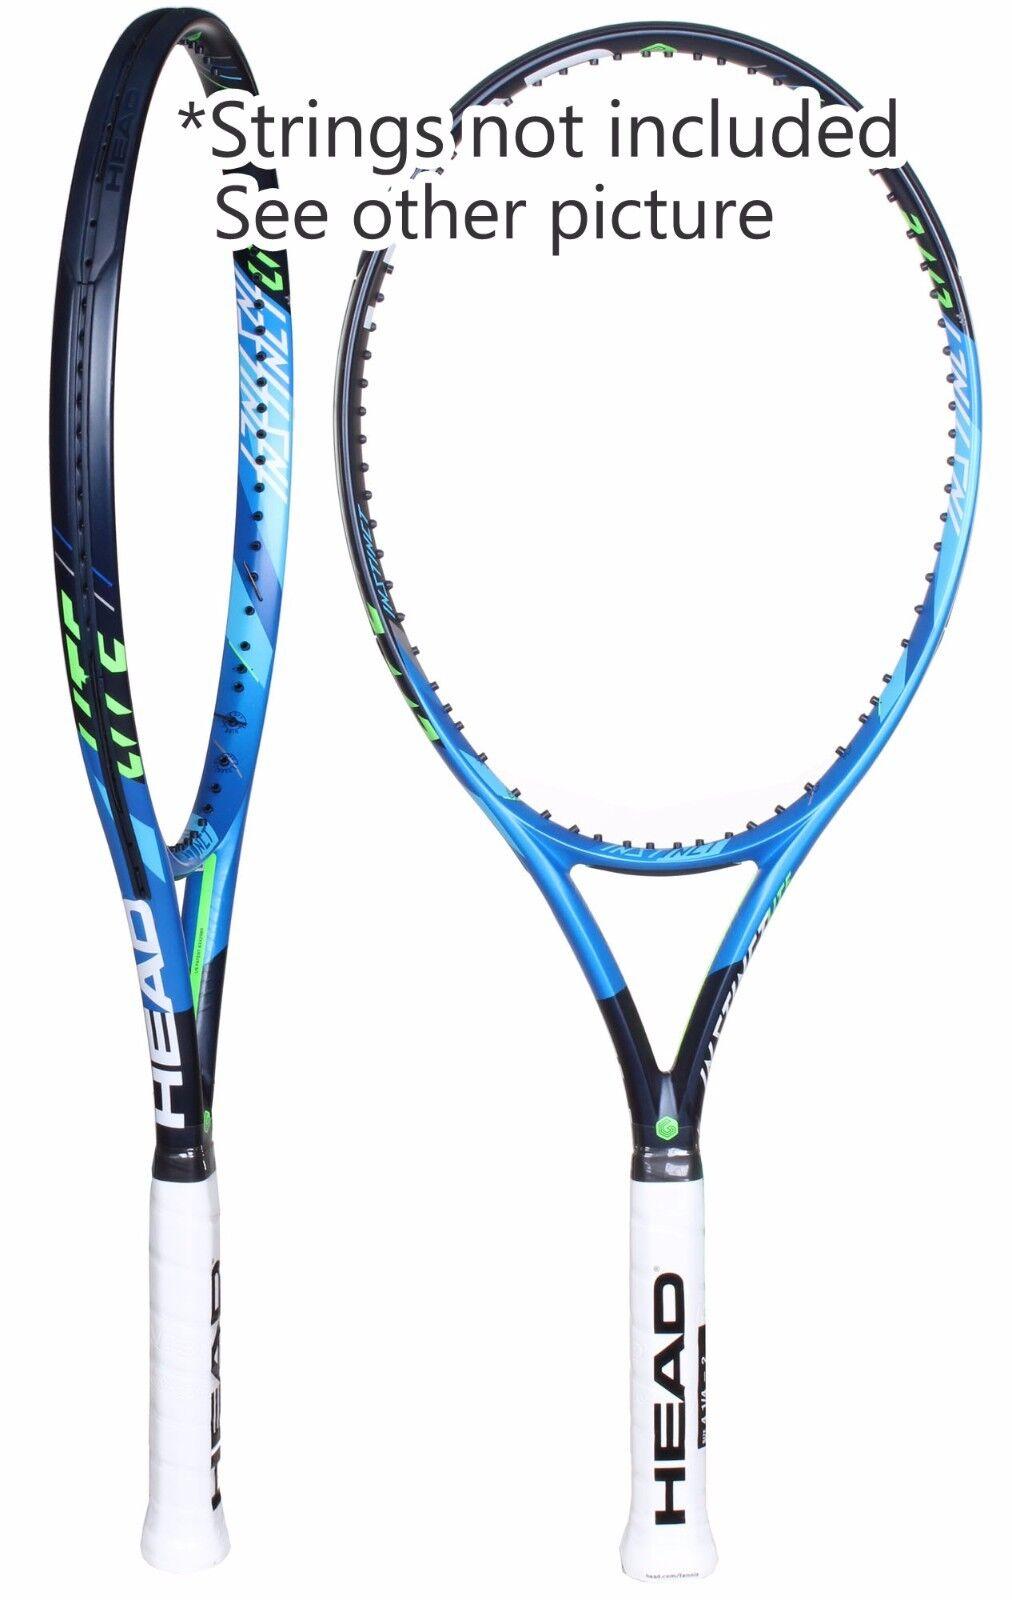 *NEW* Head Graphene Touch Instinct Lite Tennis Racquet - Aut